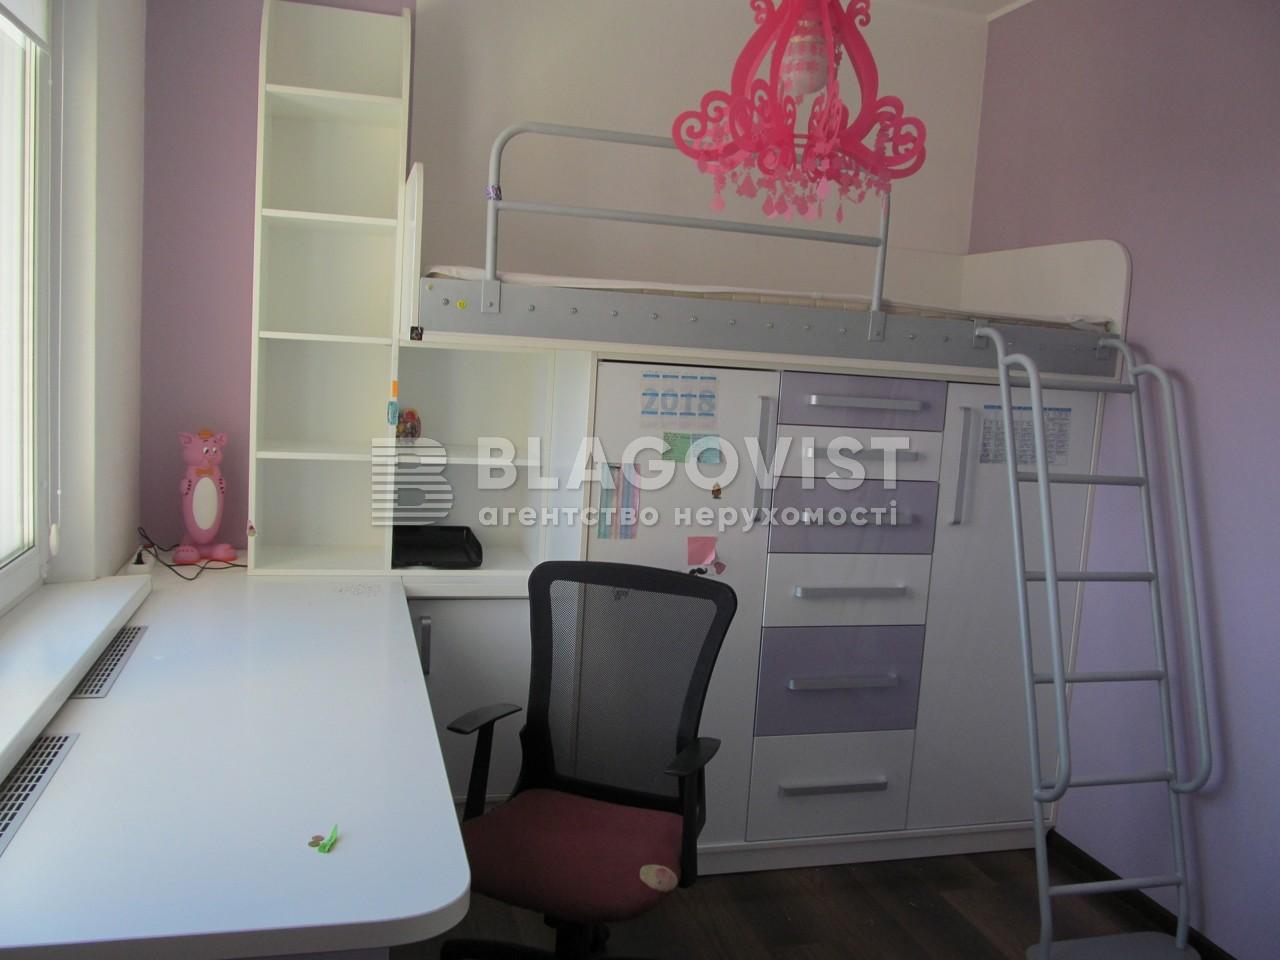 Квартира R-17985, Правды просп., 5б, Киев - Фото 11